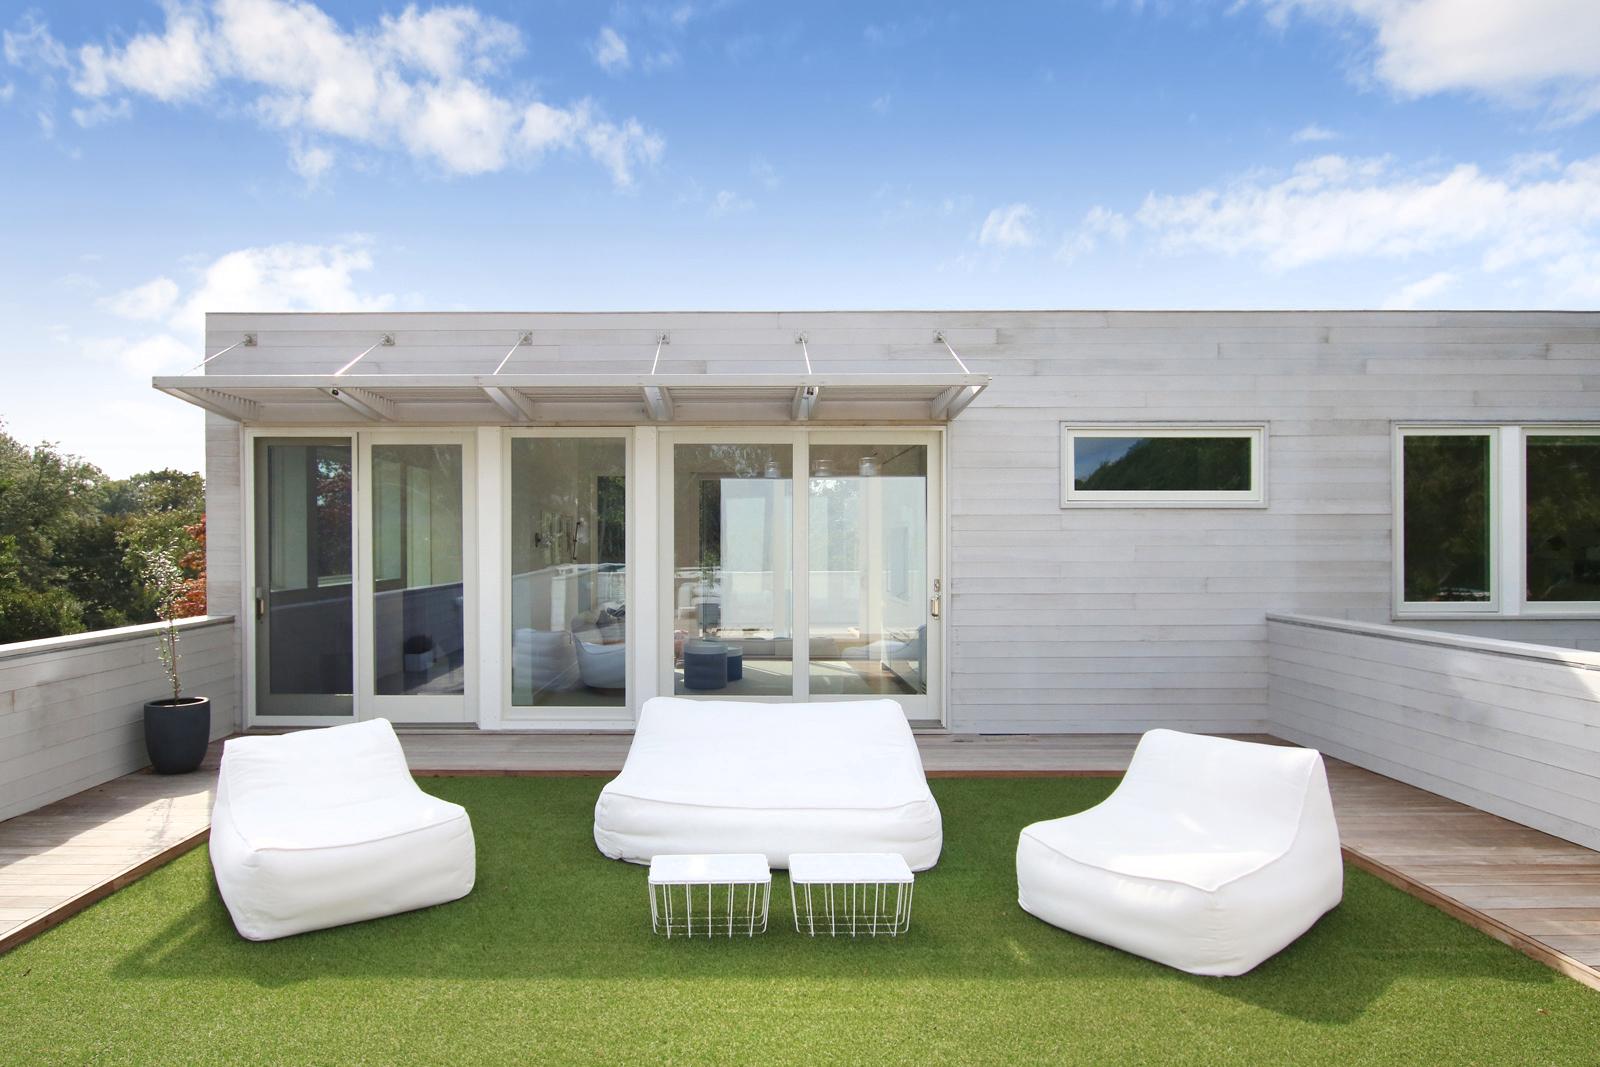 21-re4a-resolution-4-architecture-modern-modular-prefab-bridgehampton house-roof-deck.jpg